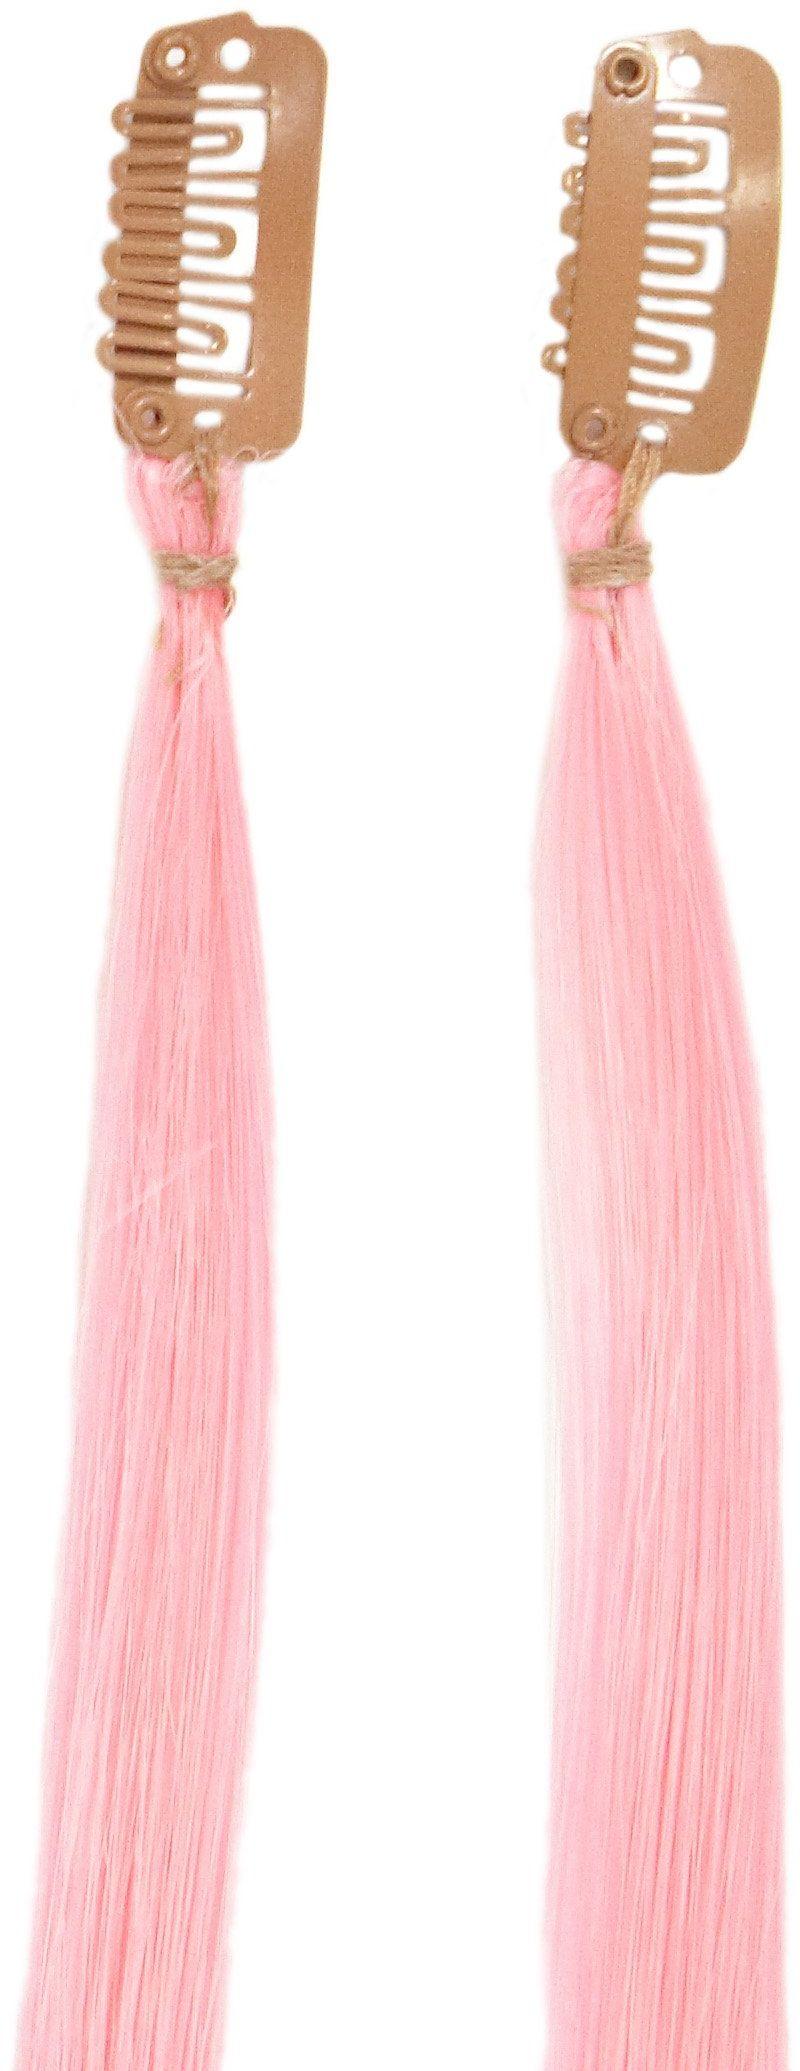 Love Hair Extensions Twinpack pasemka Clip-In, kolor Babyrosa - 41 cm, 1 opakowanie (1 x 1 sztuka)